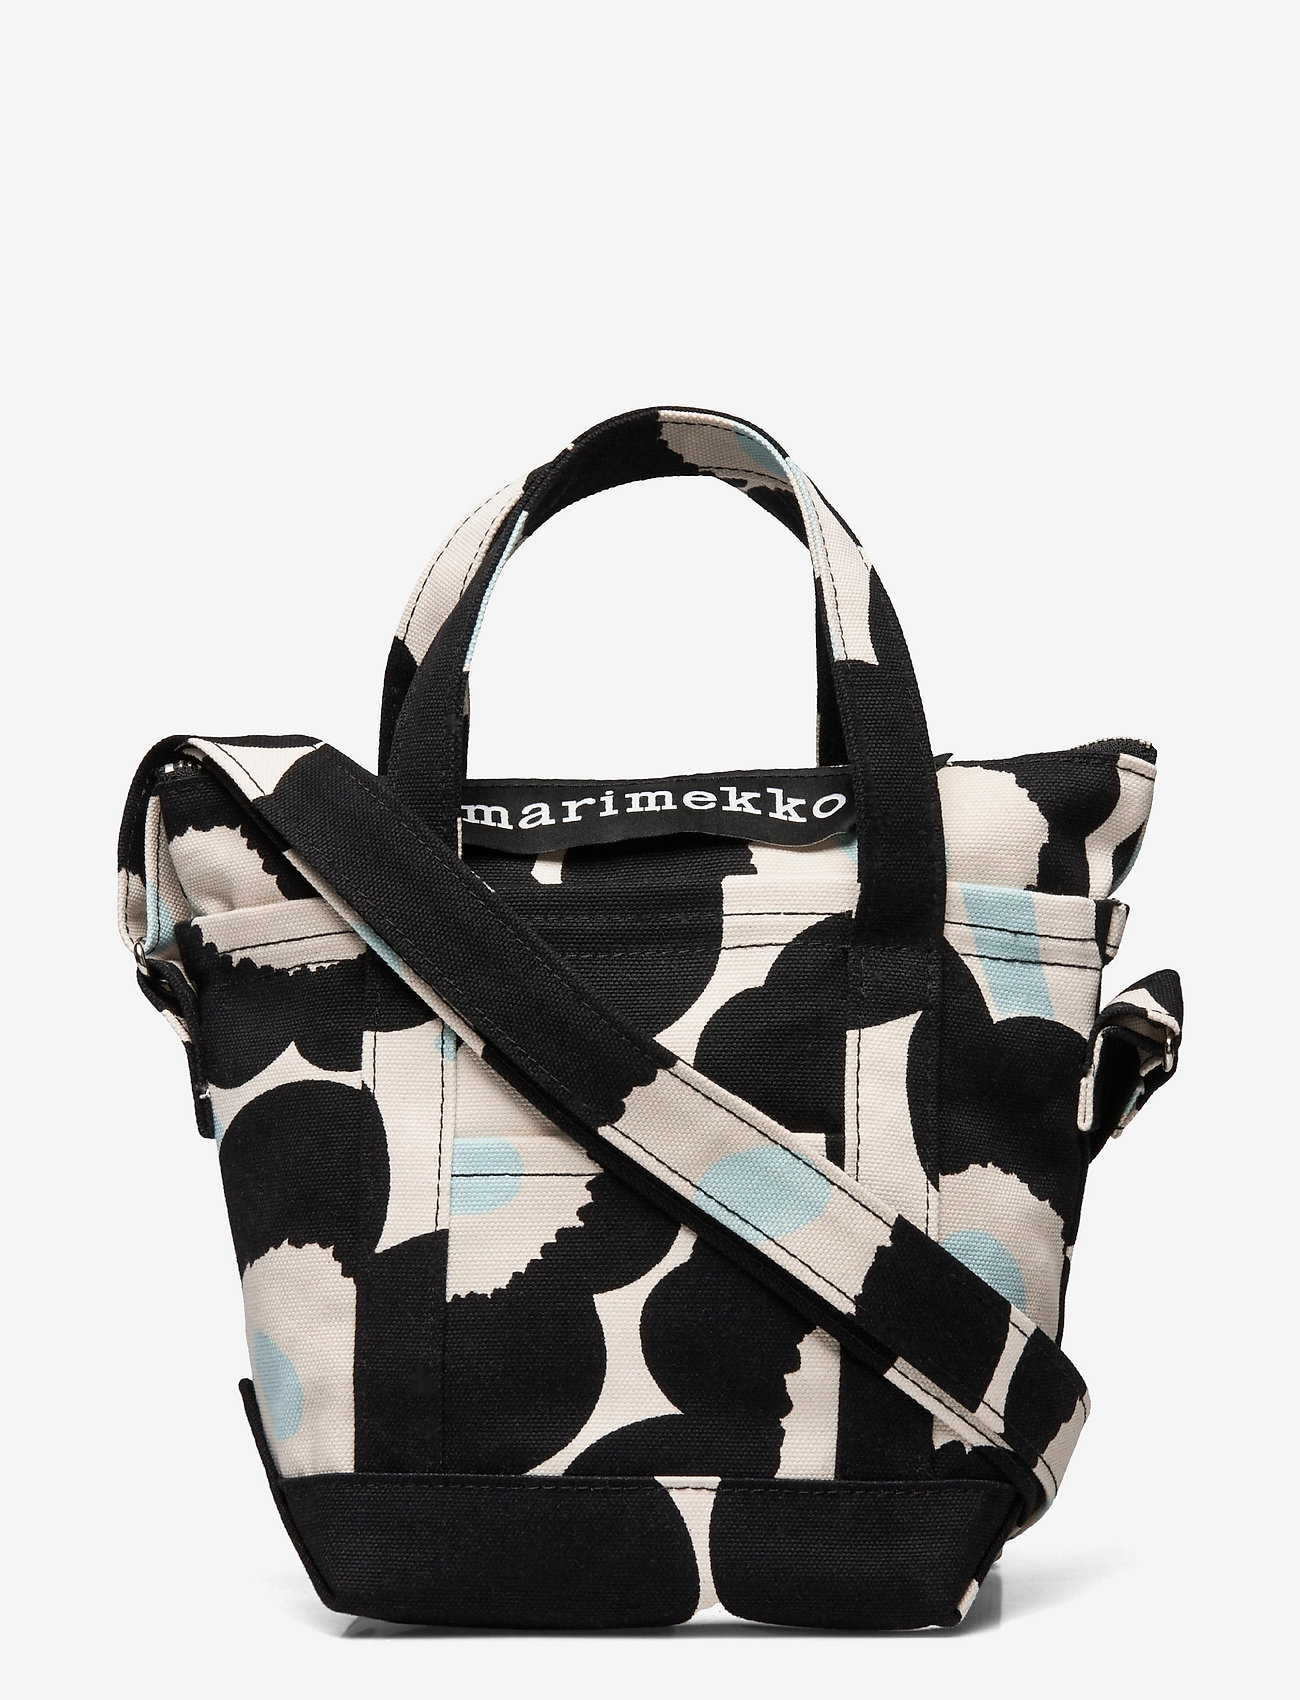 Marimekko - MILLI MATKURI PIENI UNIKKO 2 BAG - skuldertasker - off white,black,light blue - 0